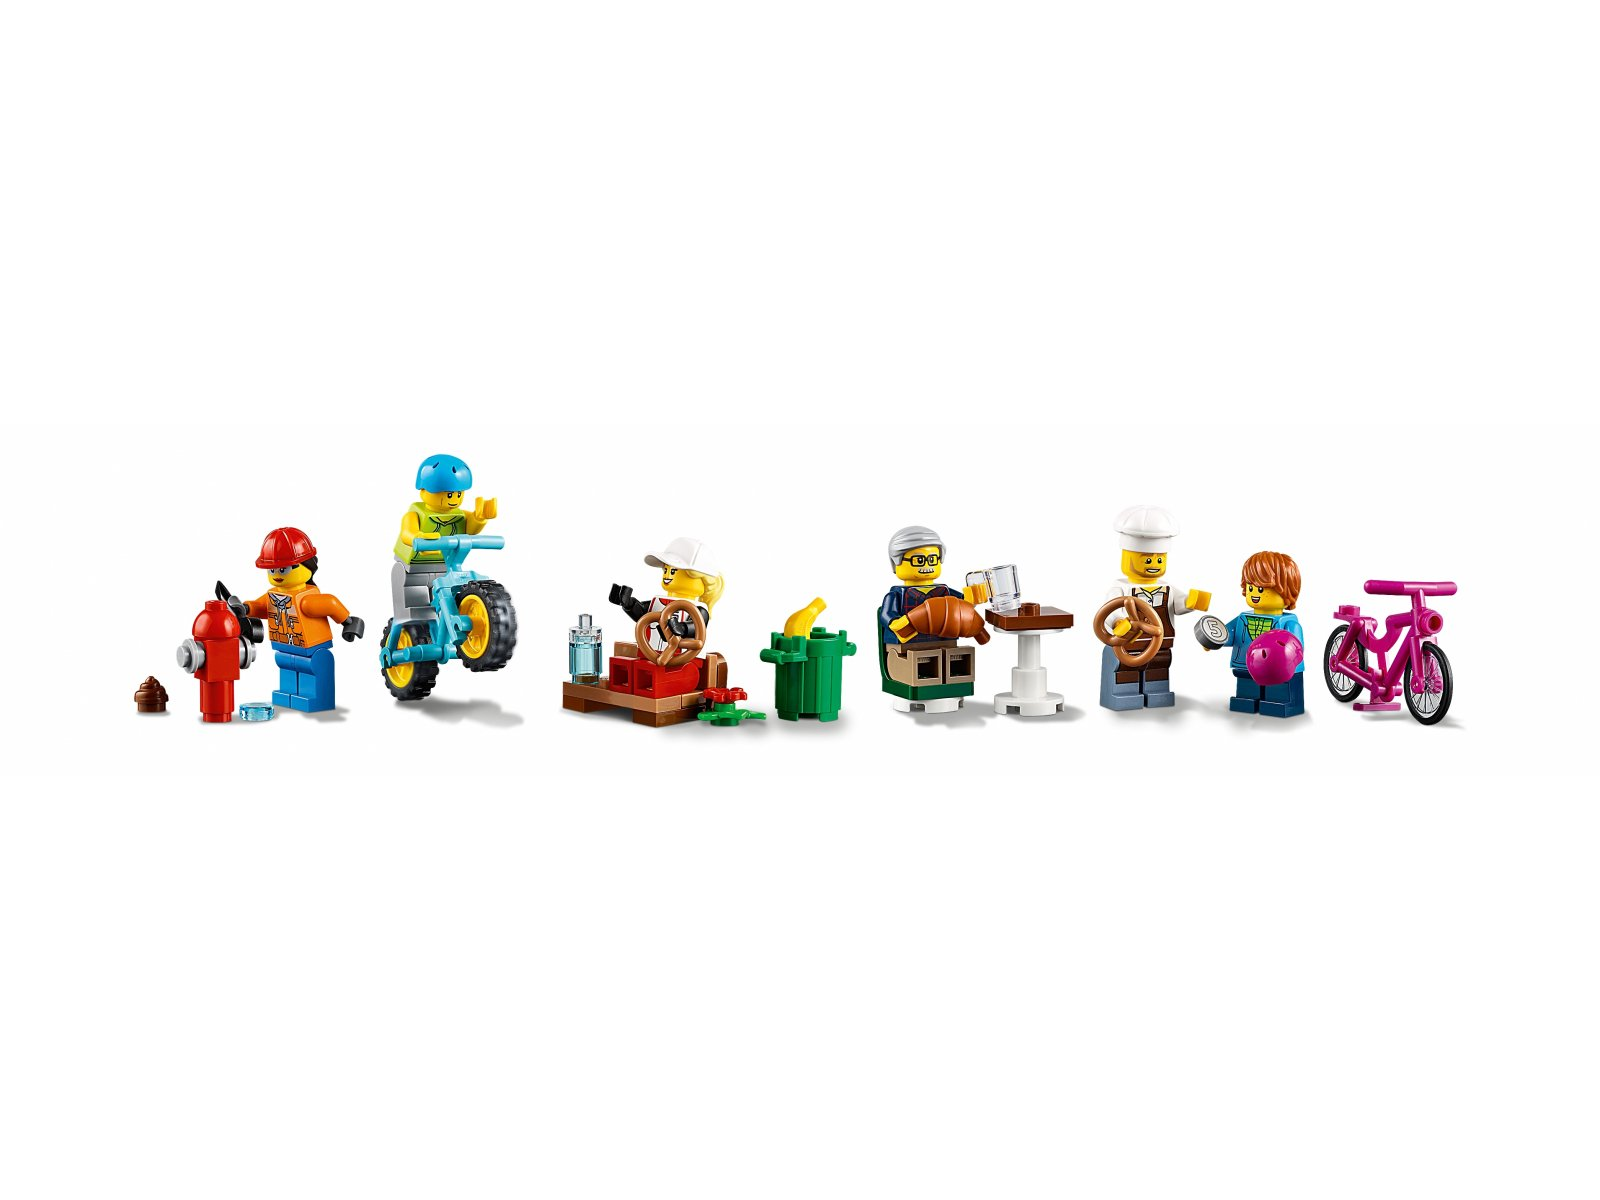 LEGO 60306 Ulica handlowa